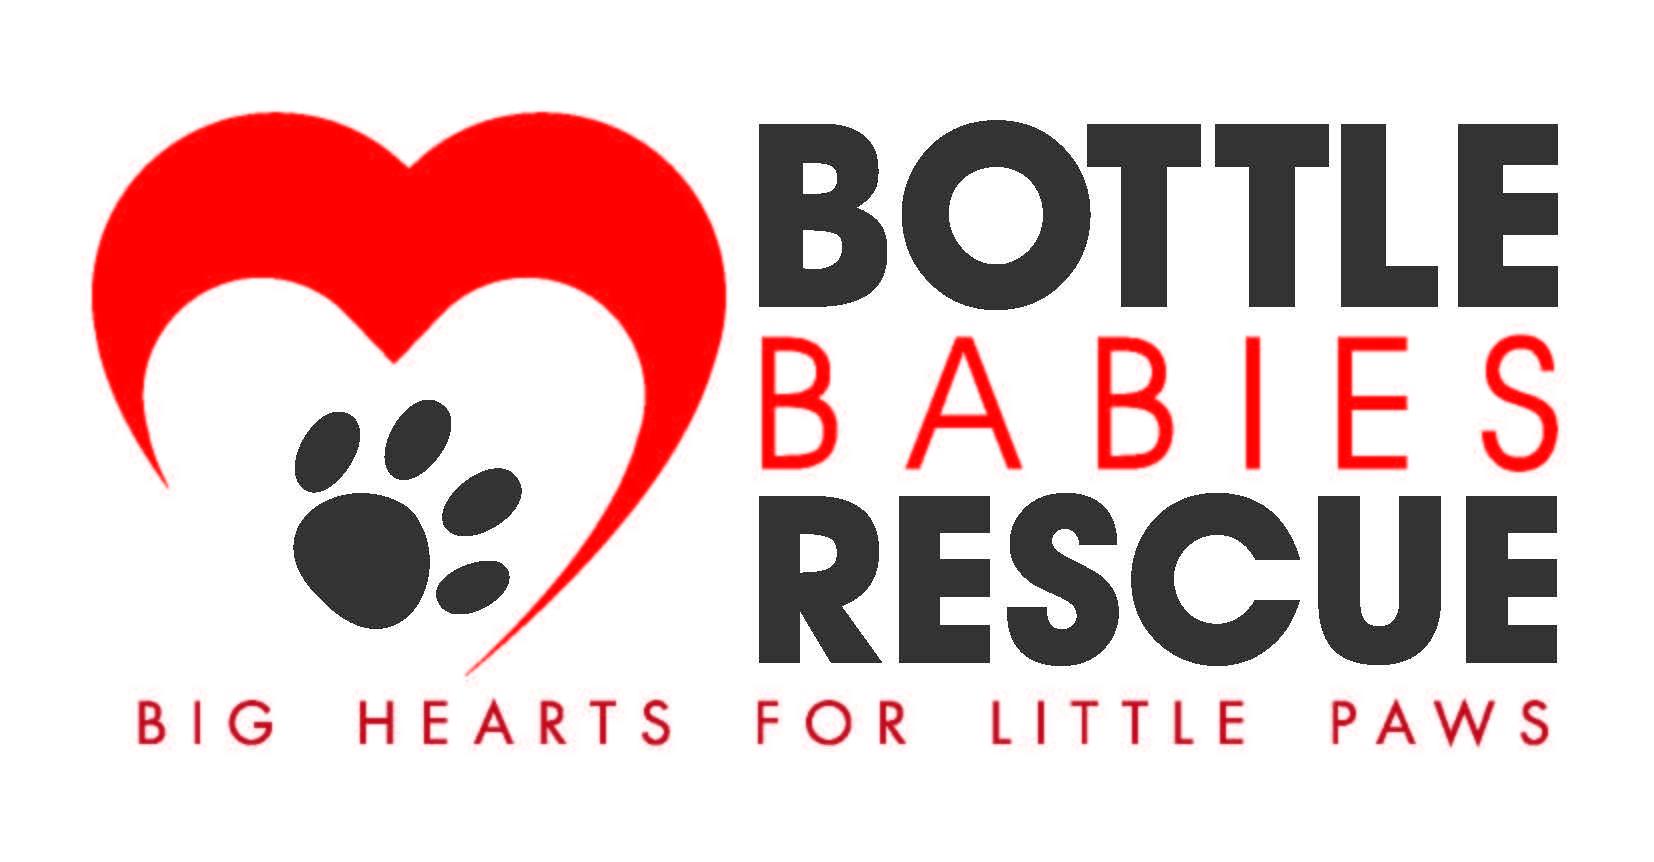 Bottle Babies Rescue